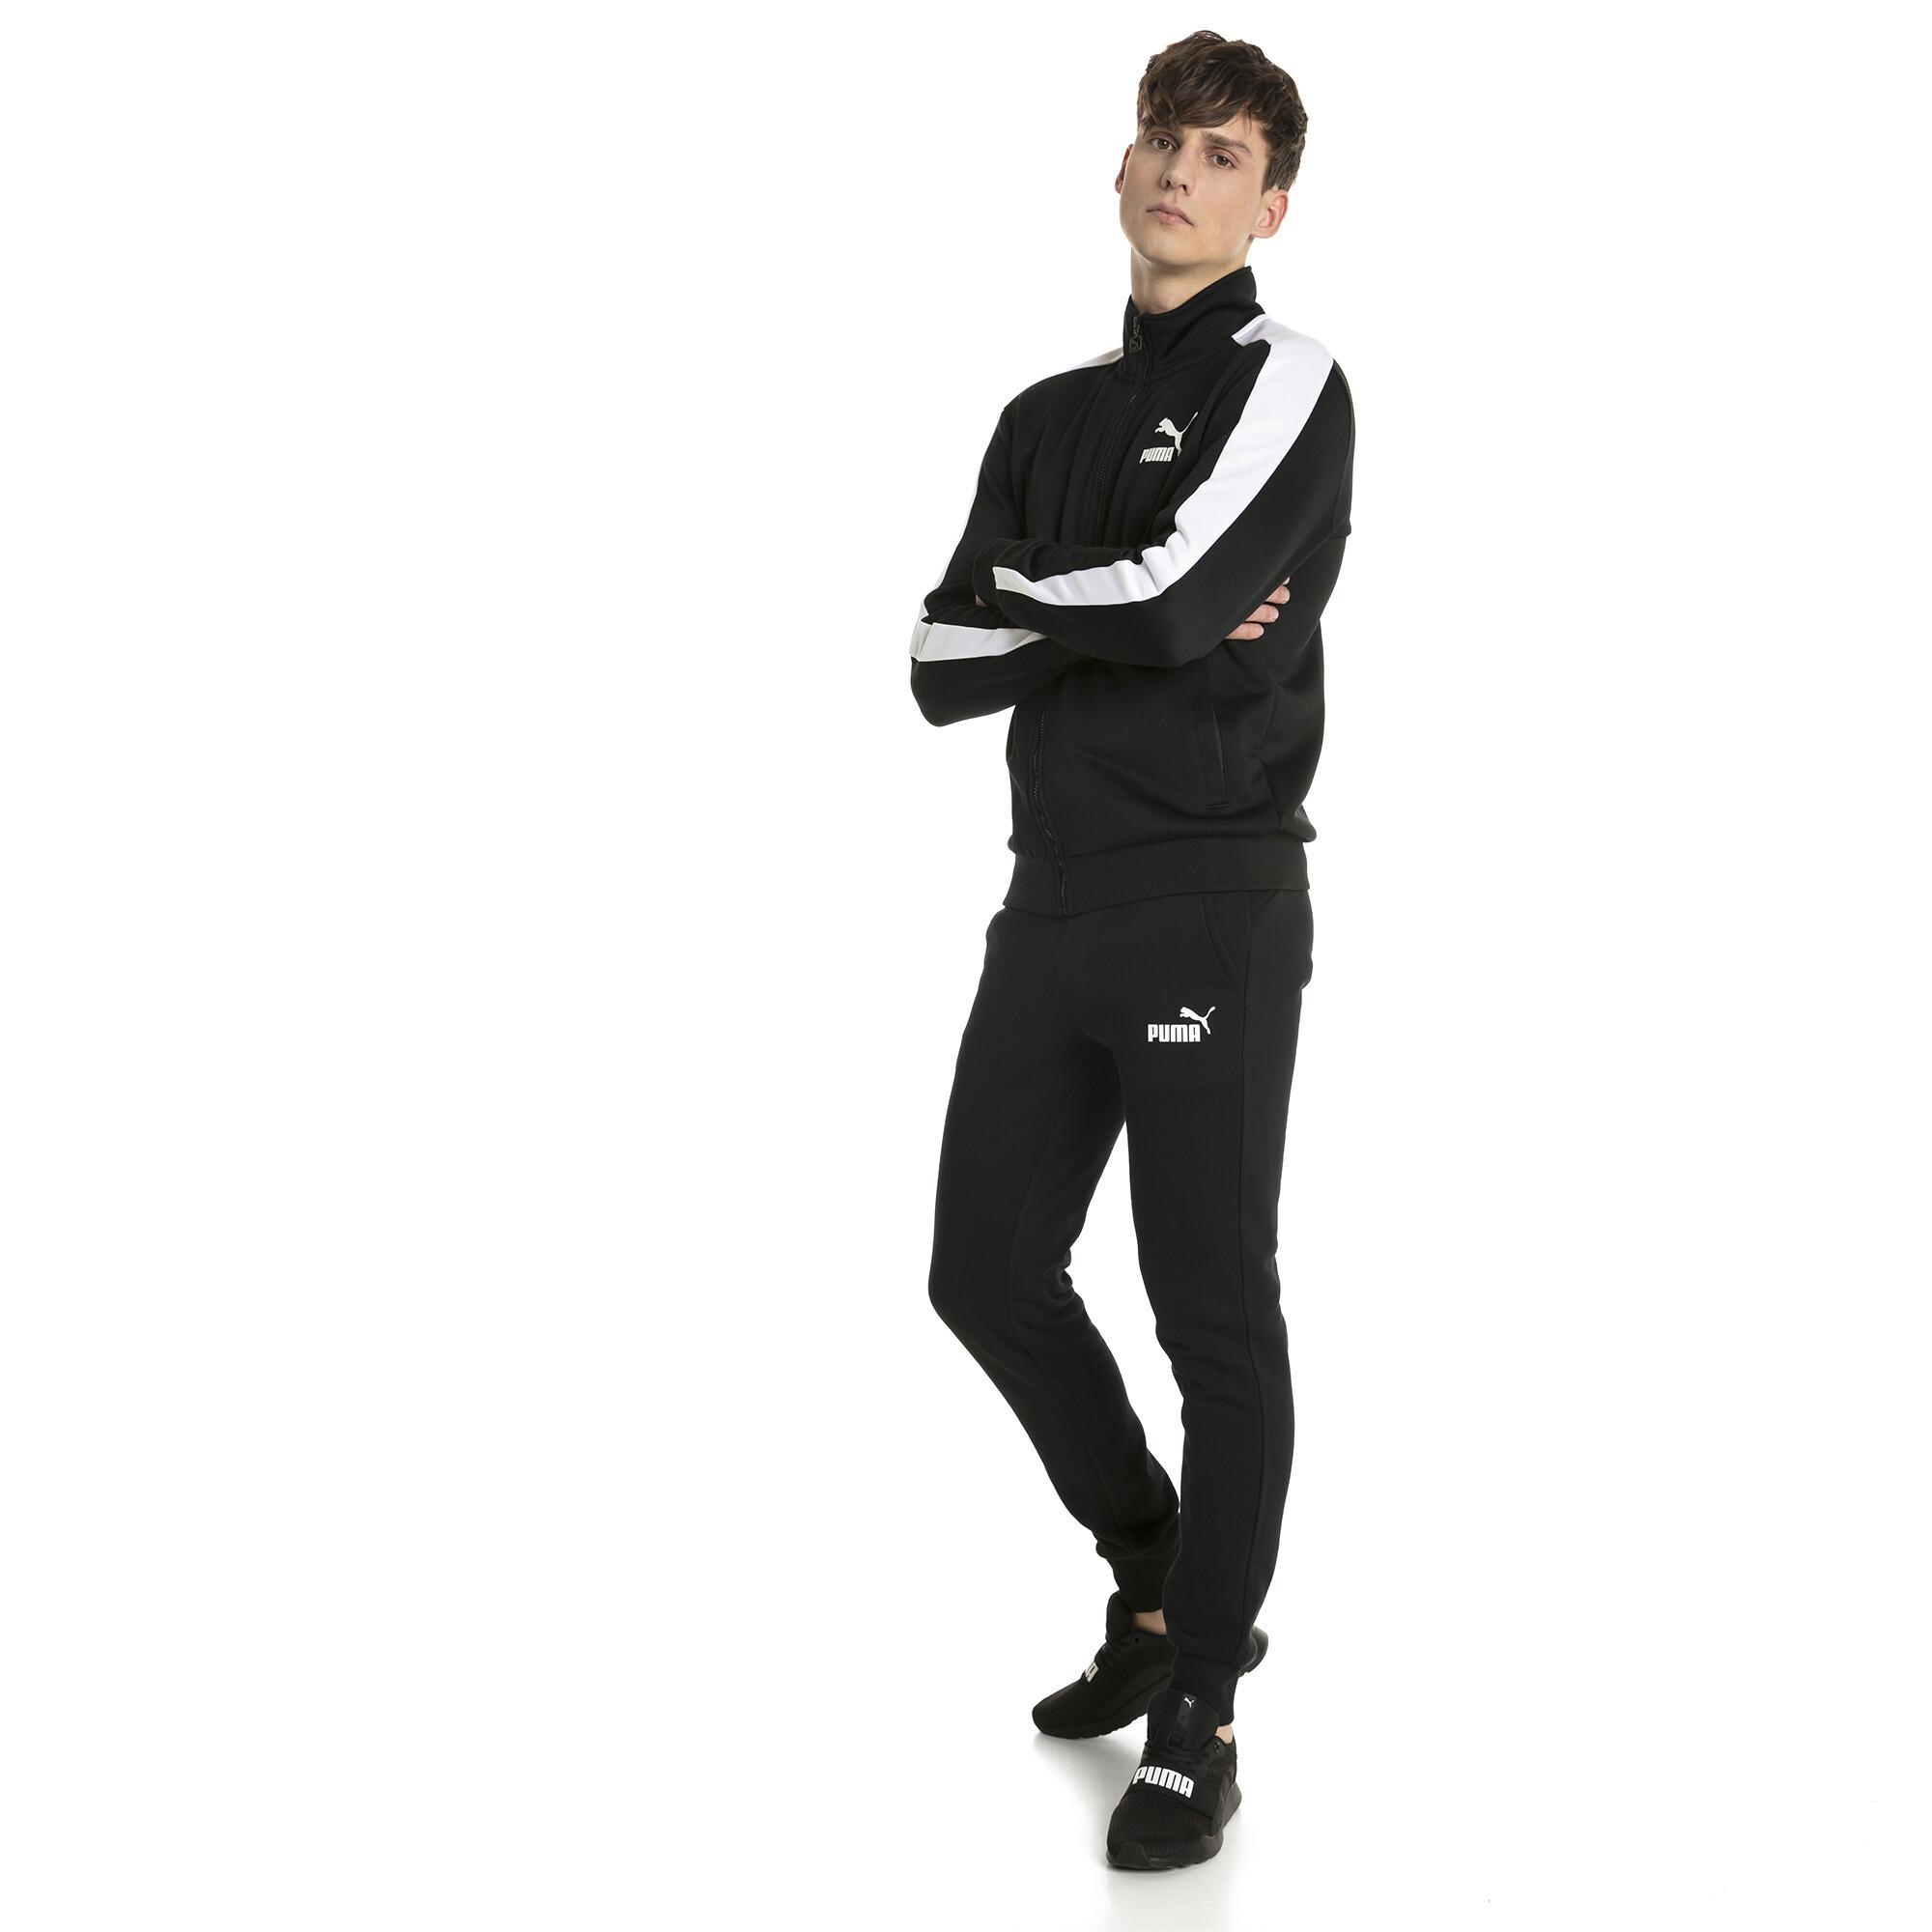 PUMA-Essentials-Men-039-s-Fleece-Knit-Pants-Men-Knitted-Pants-Basics thumbnail 16